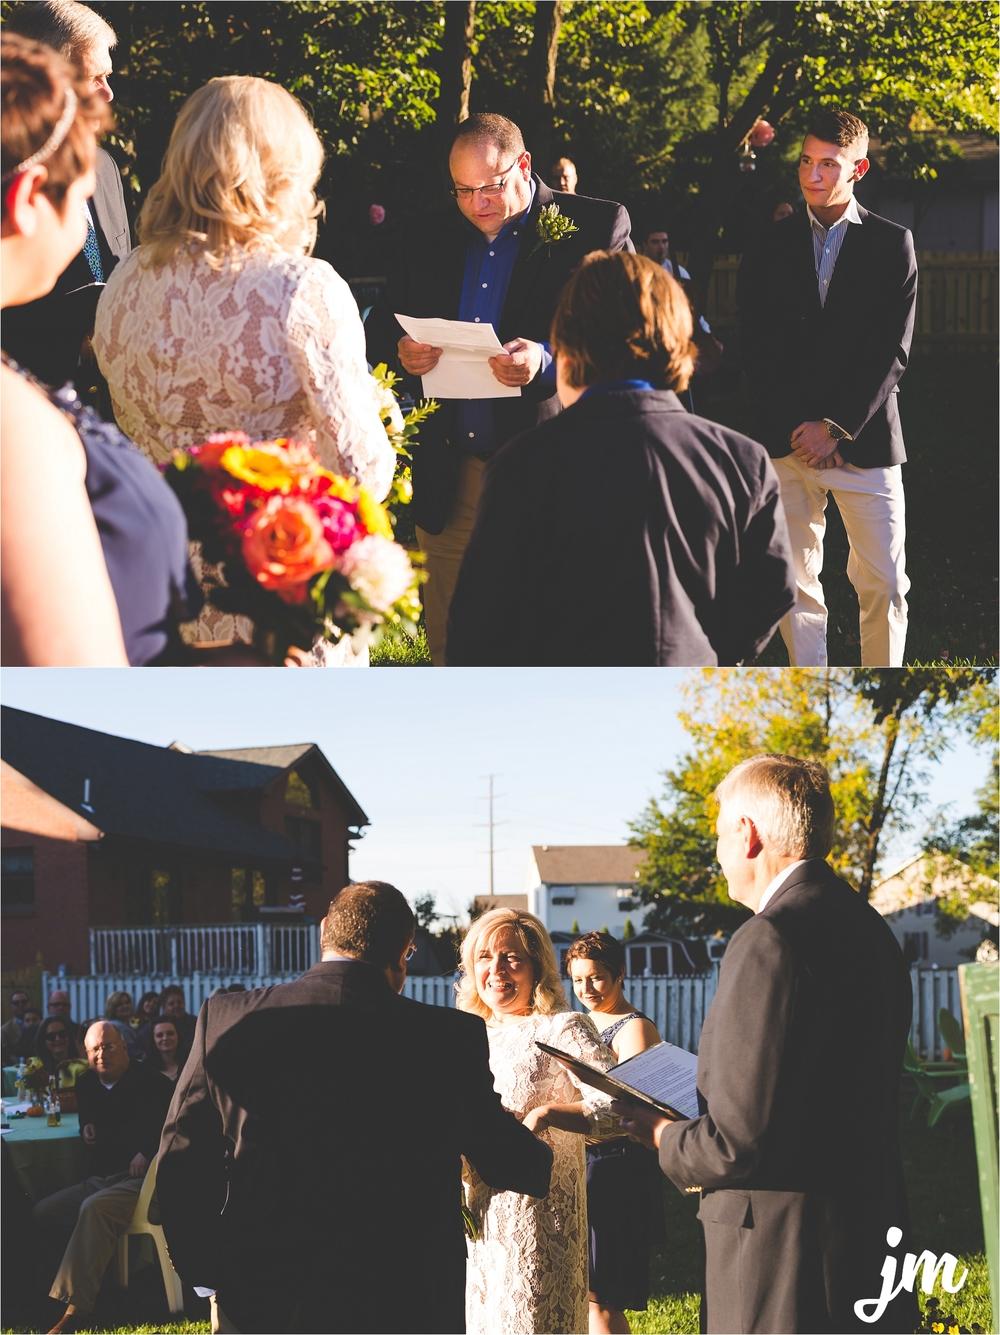 backyard-wedding-pacific-northwest-photographer-jannicka-mayte_0016.jpg